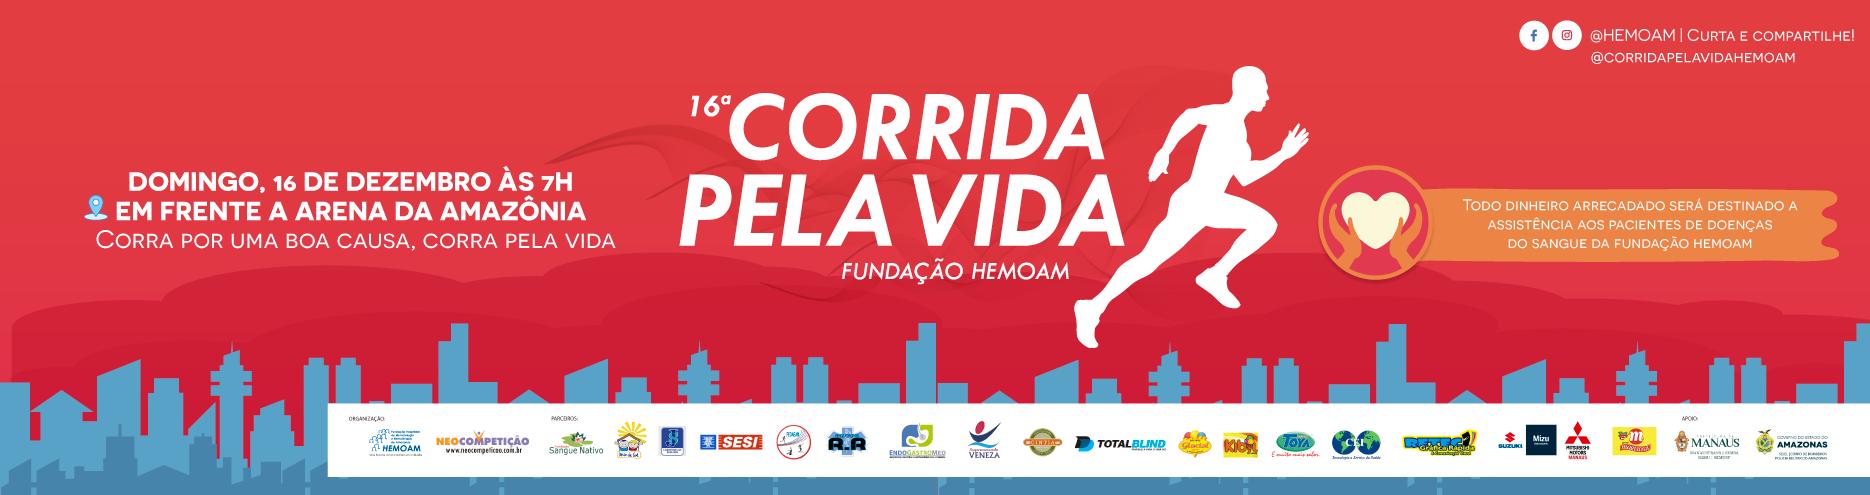 16ª CORRIDA PELA VIDA - HEMOAM